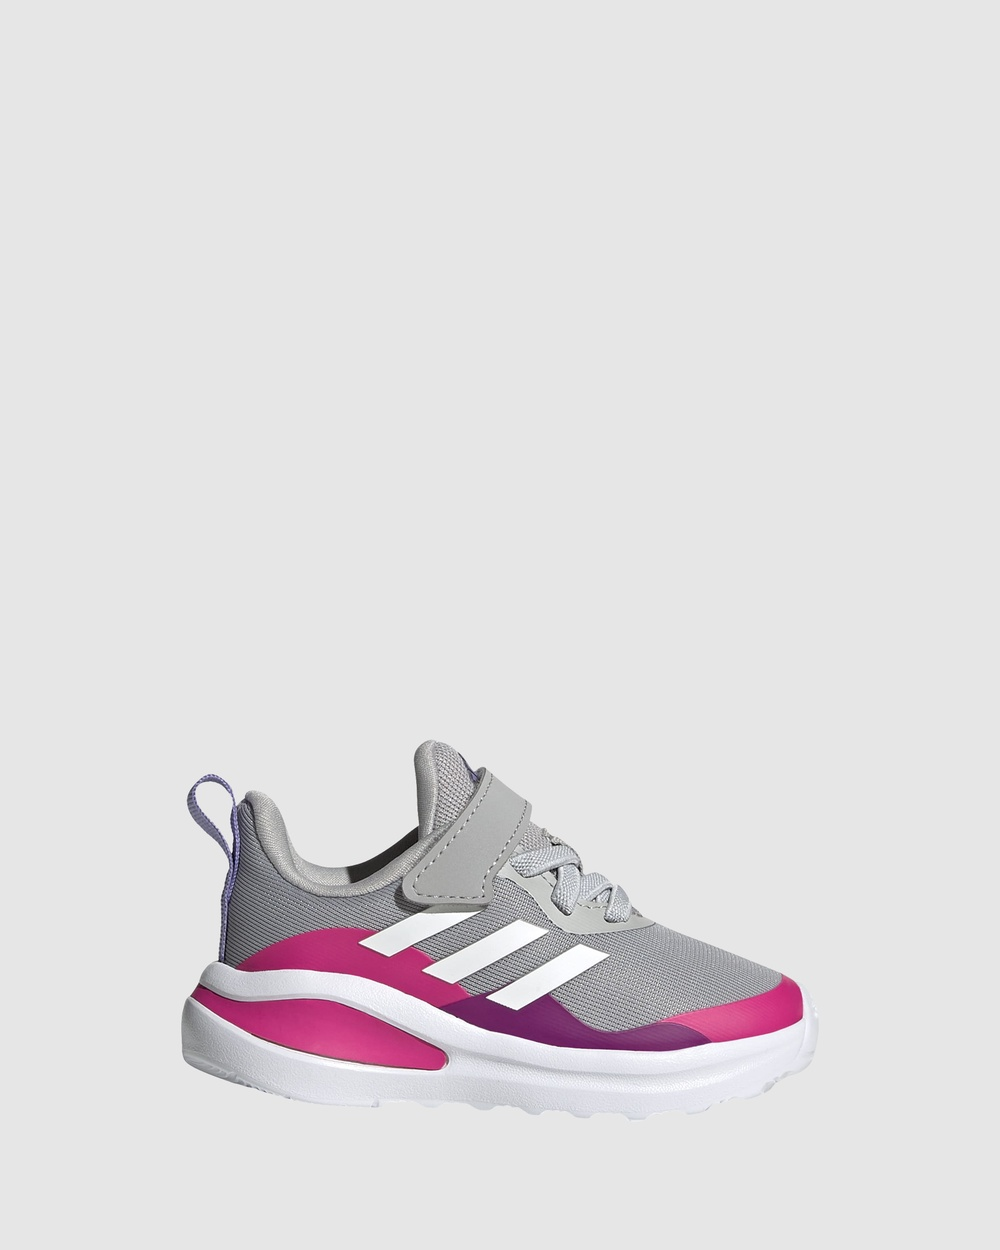 adidas Performance Fortarun EL Infant Lifestyle Shoes Grey/White/Pink